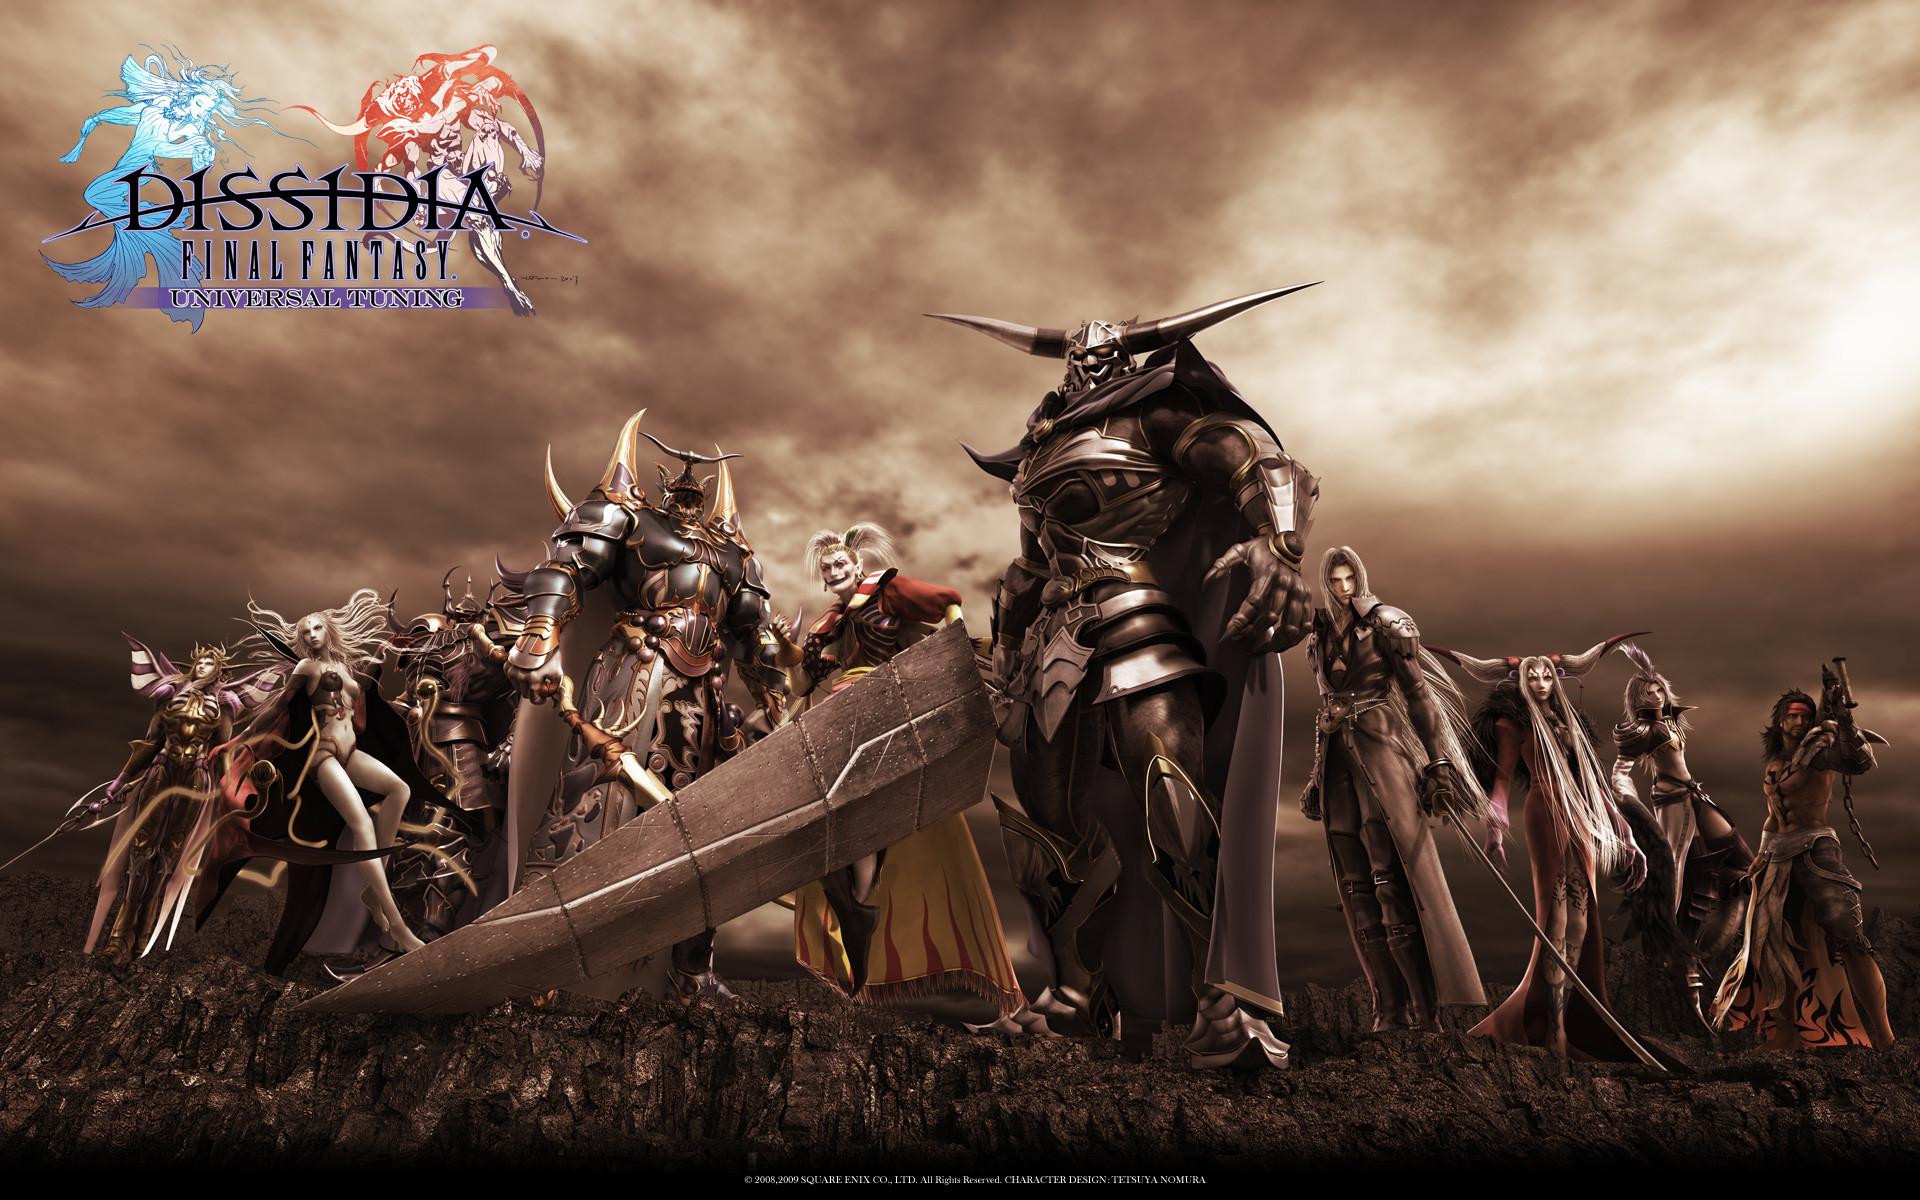 Image – Chaos 1920 1200.jpg | Final Fantasy Wiki | FANDOM powered by Wikia